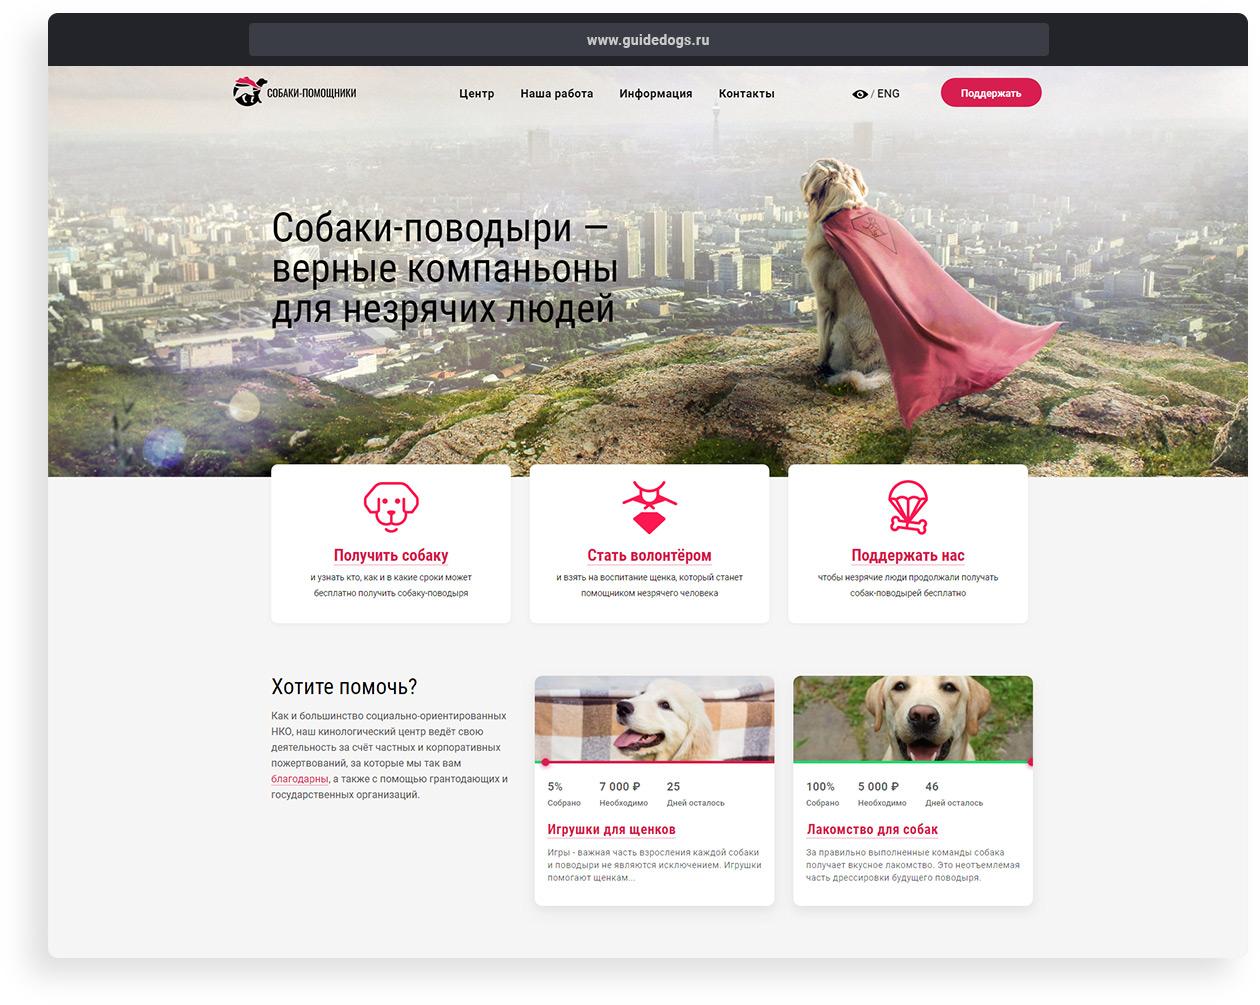 Разработка сайта для центра собак-поводырей